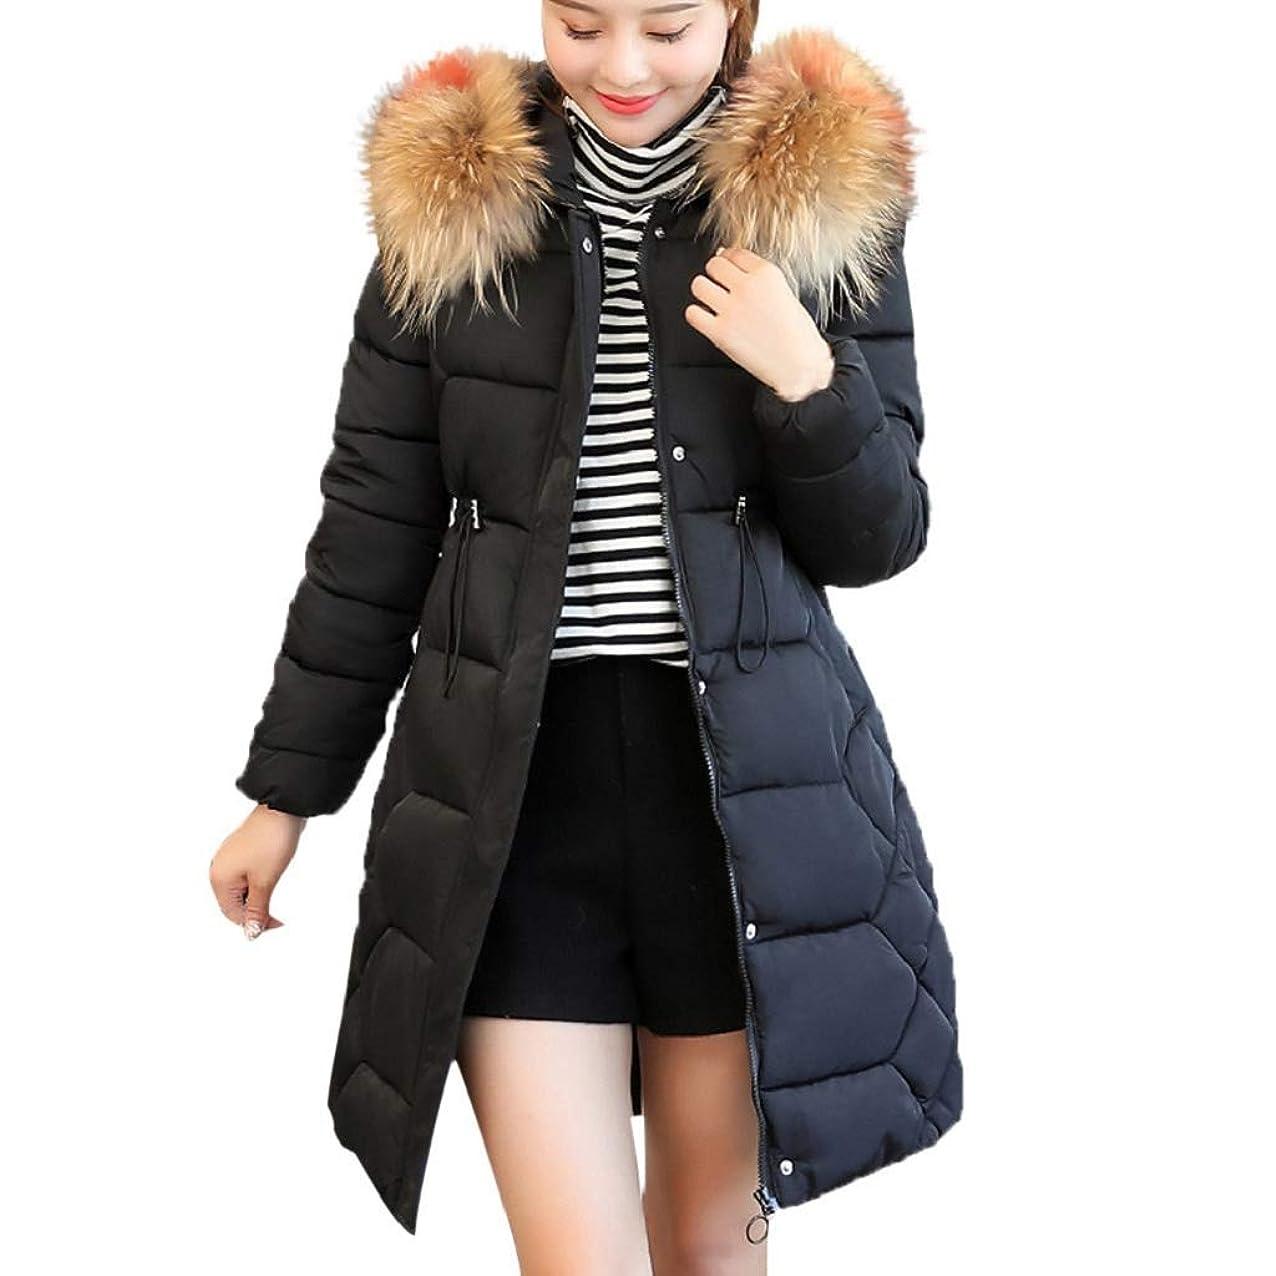 Creazrise Women's Winter Puffer Mid Length Cargo Pocket Coat Fur Trim Removable Hood (Black,3XL) tvigxcncjixhk243